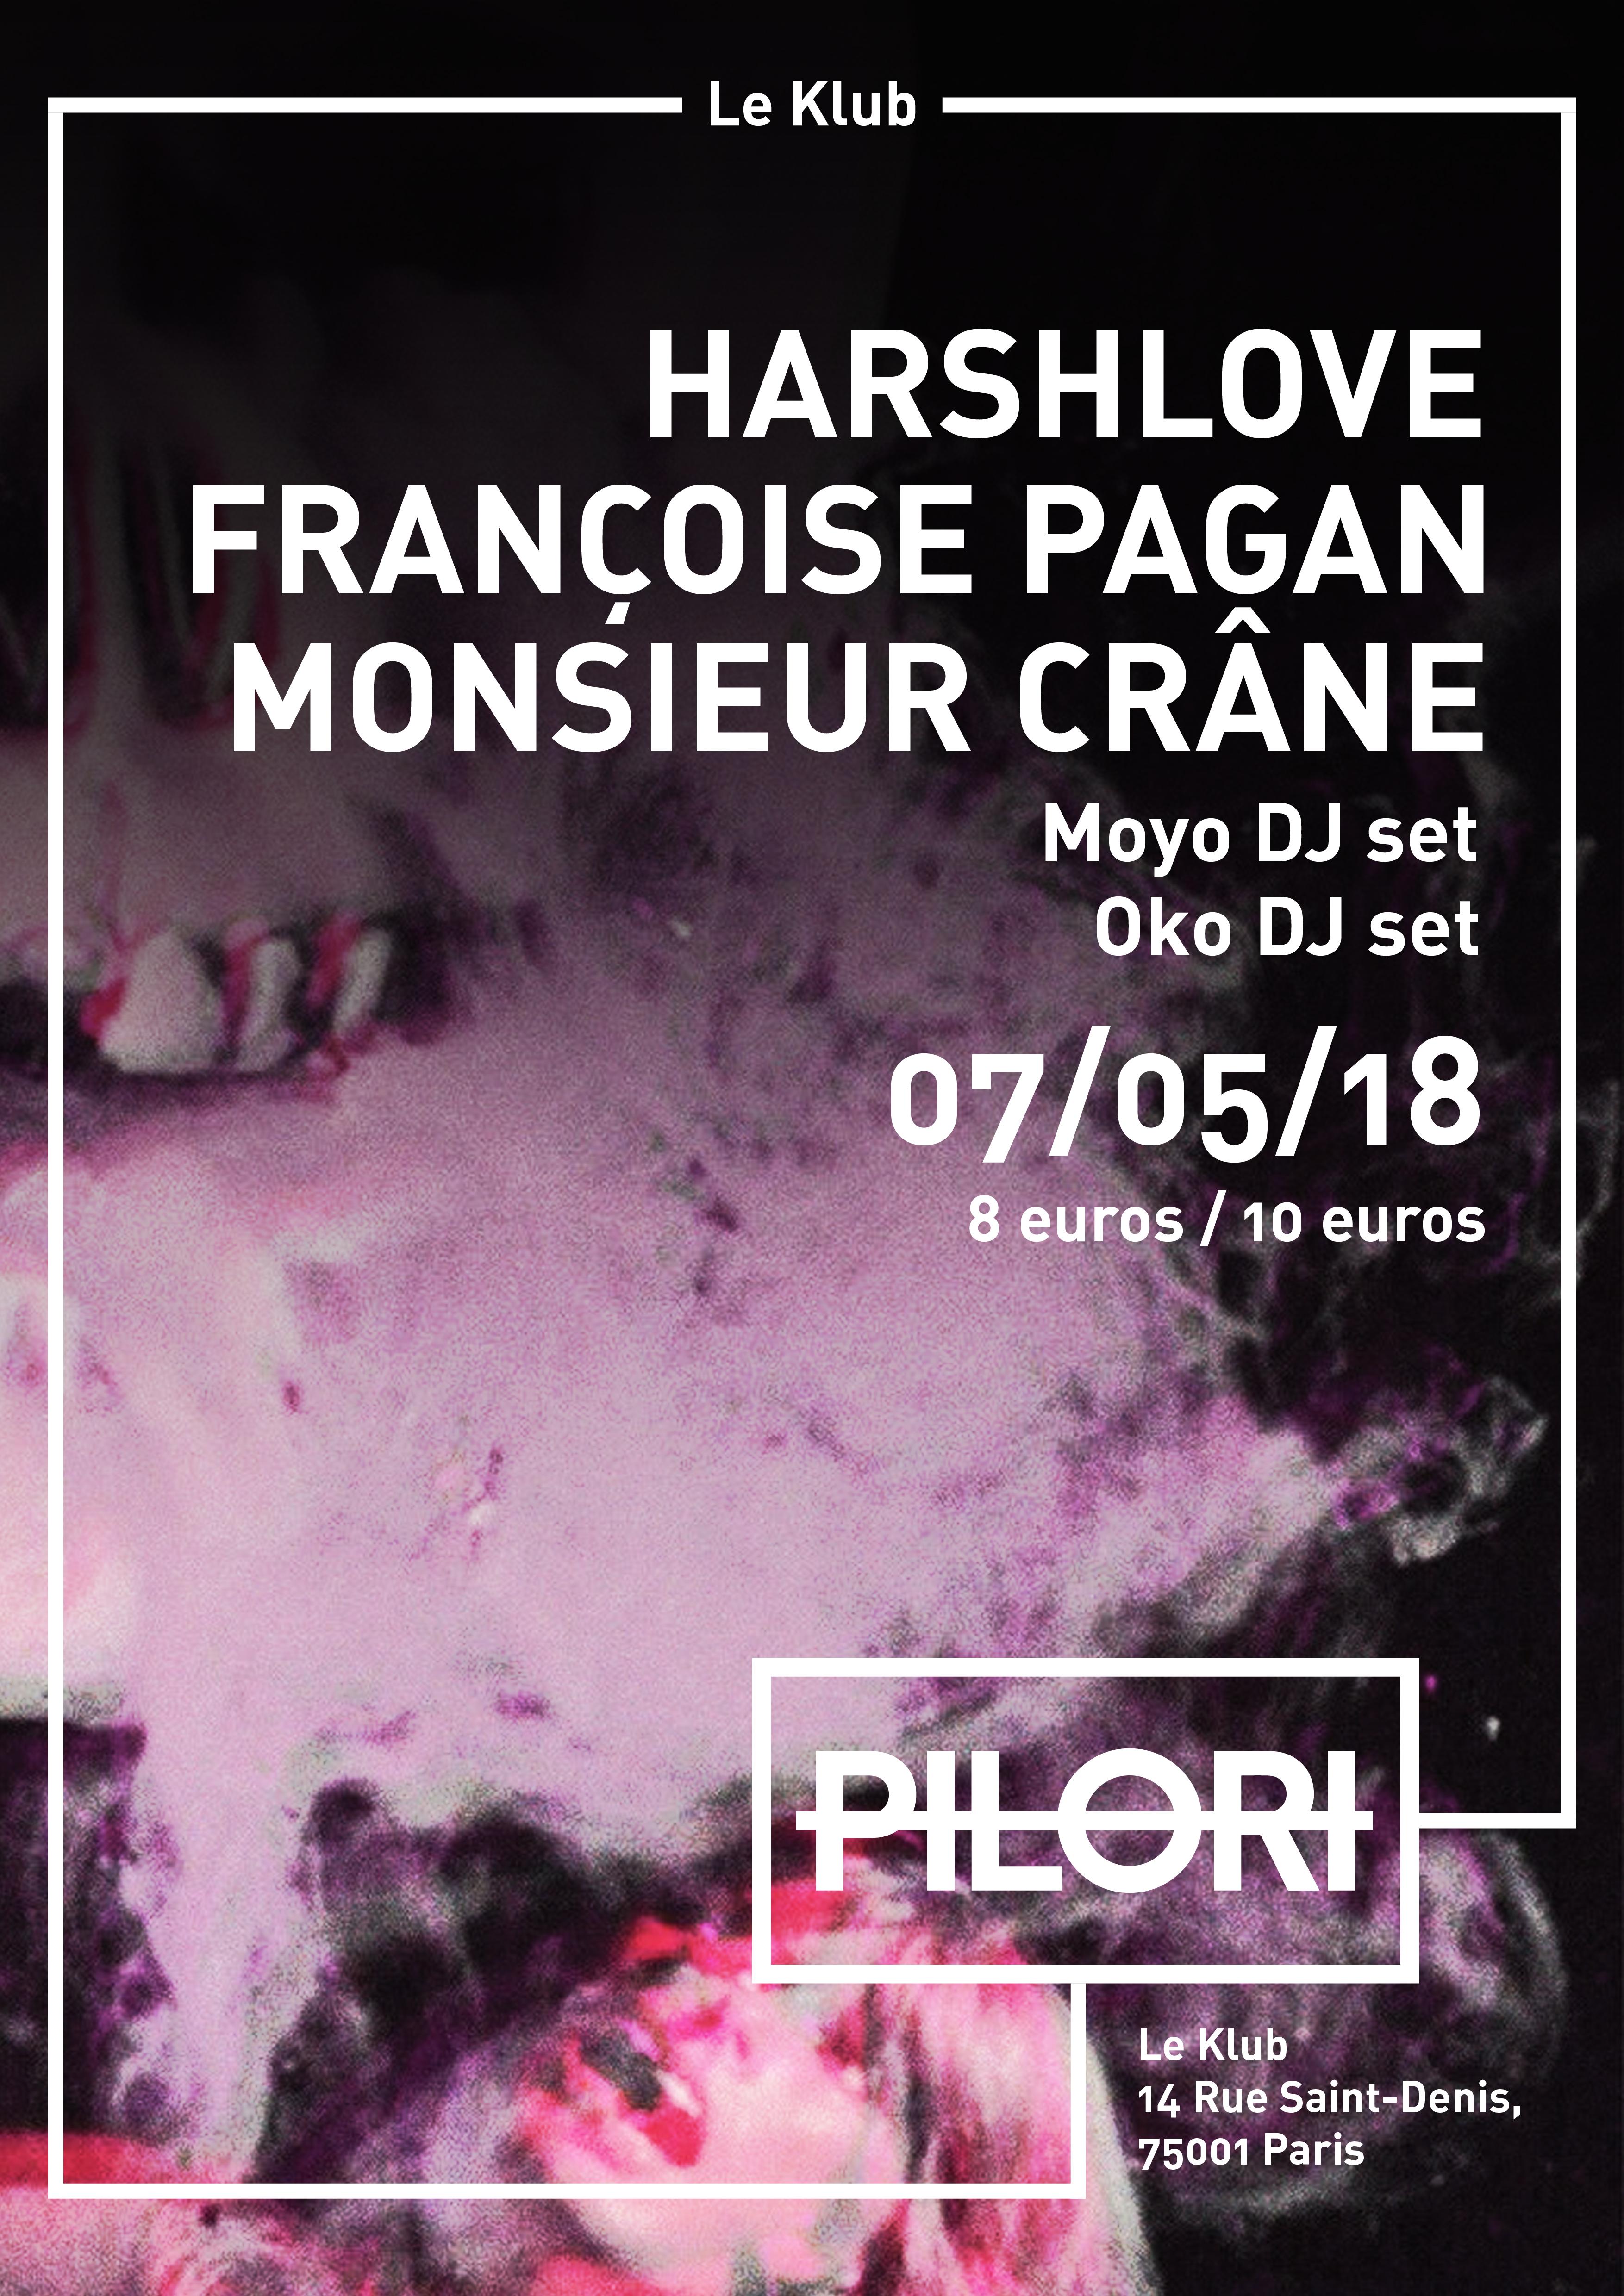 PILORI LAUNCH PARTY ■ 07.05